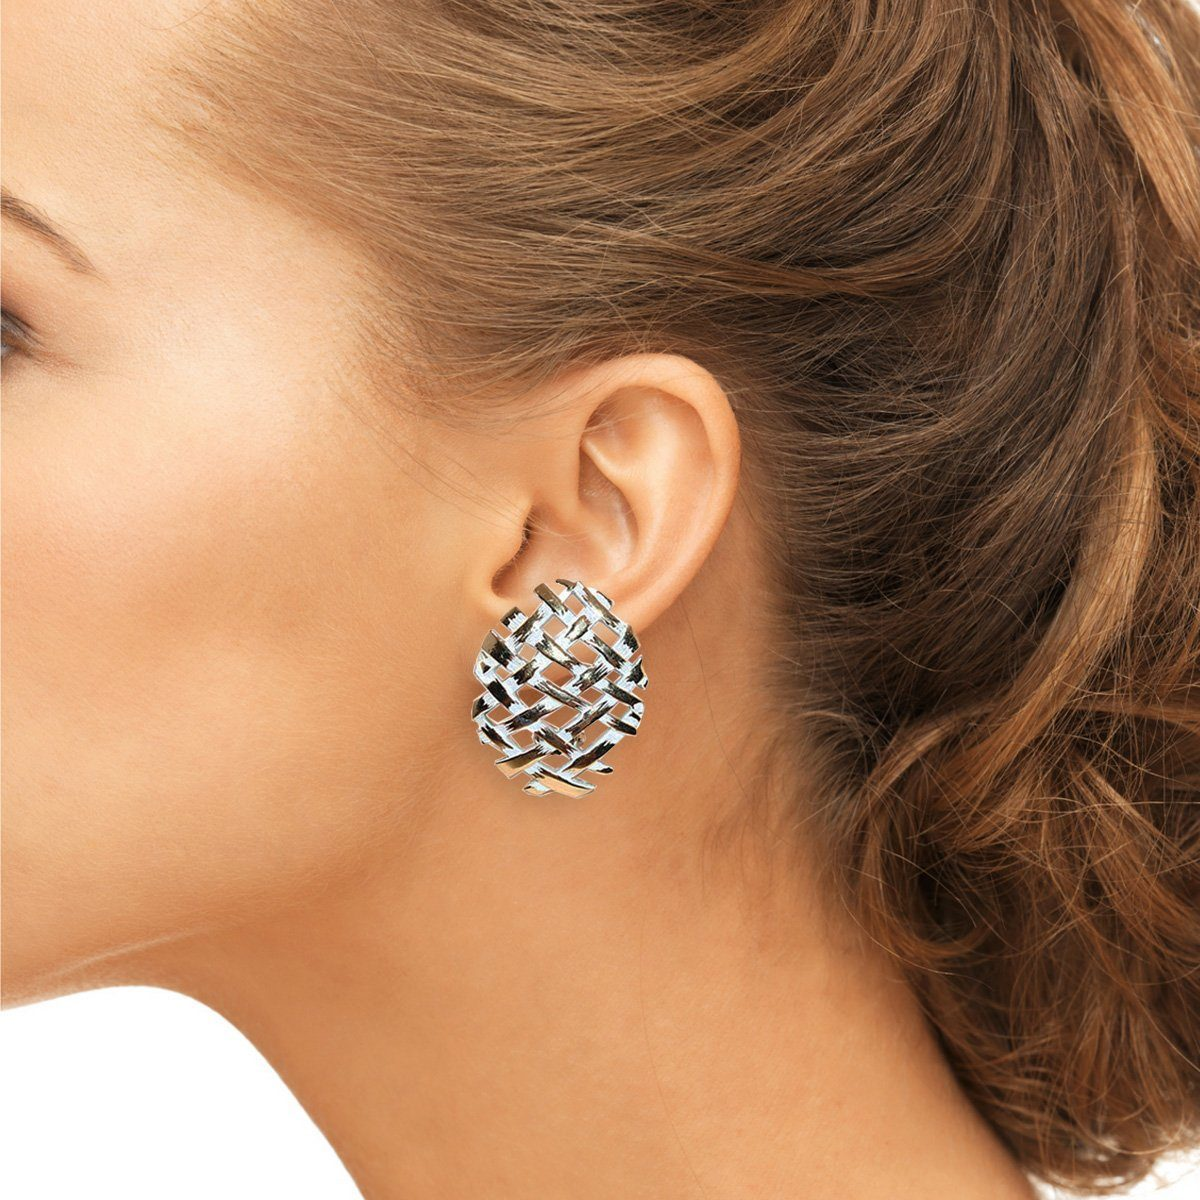 Modernist Clip Earrings in Gold Metal & White Enamel